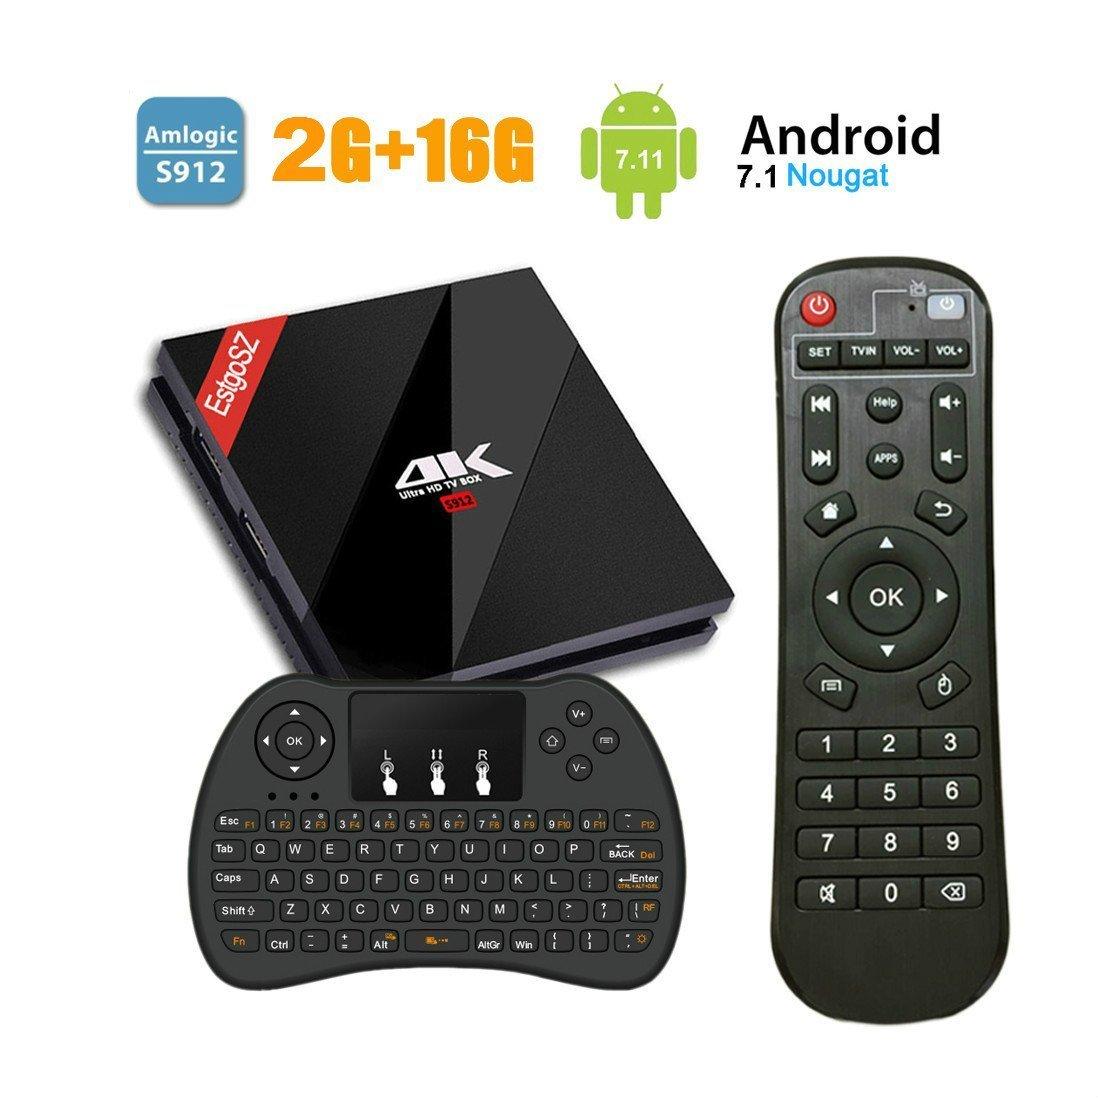 [2018 Modè le] EstgoSZ Android 7.1 Smart TV Box avec Clavier sans Fil, 2Go+16Go 4K Ultra HD Boî tier TV avec Amlogic S912 Octa-Core 64 Bits CPU 2.4 / 5GHz WiFi 1000M LAN Bluetooth 4.1 H.265 Set Top Box UKSoku 2+16G+JP